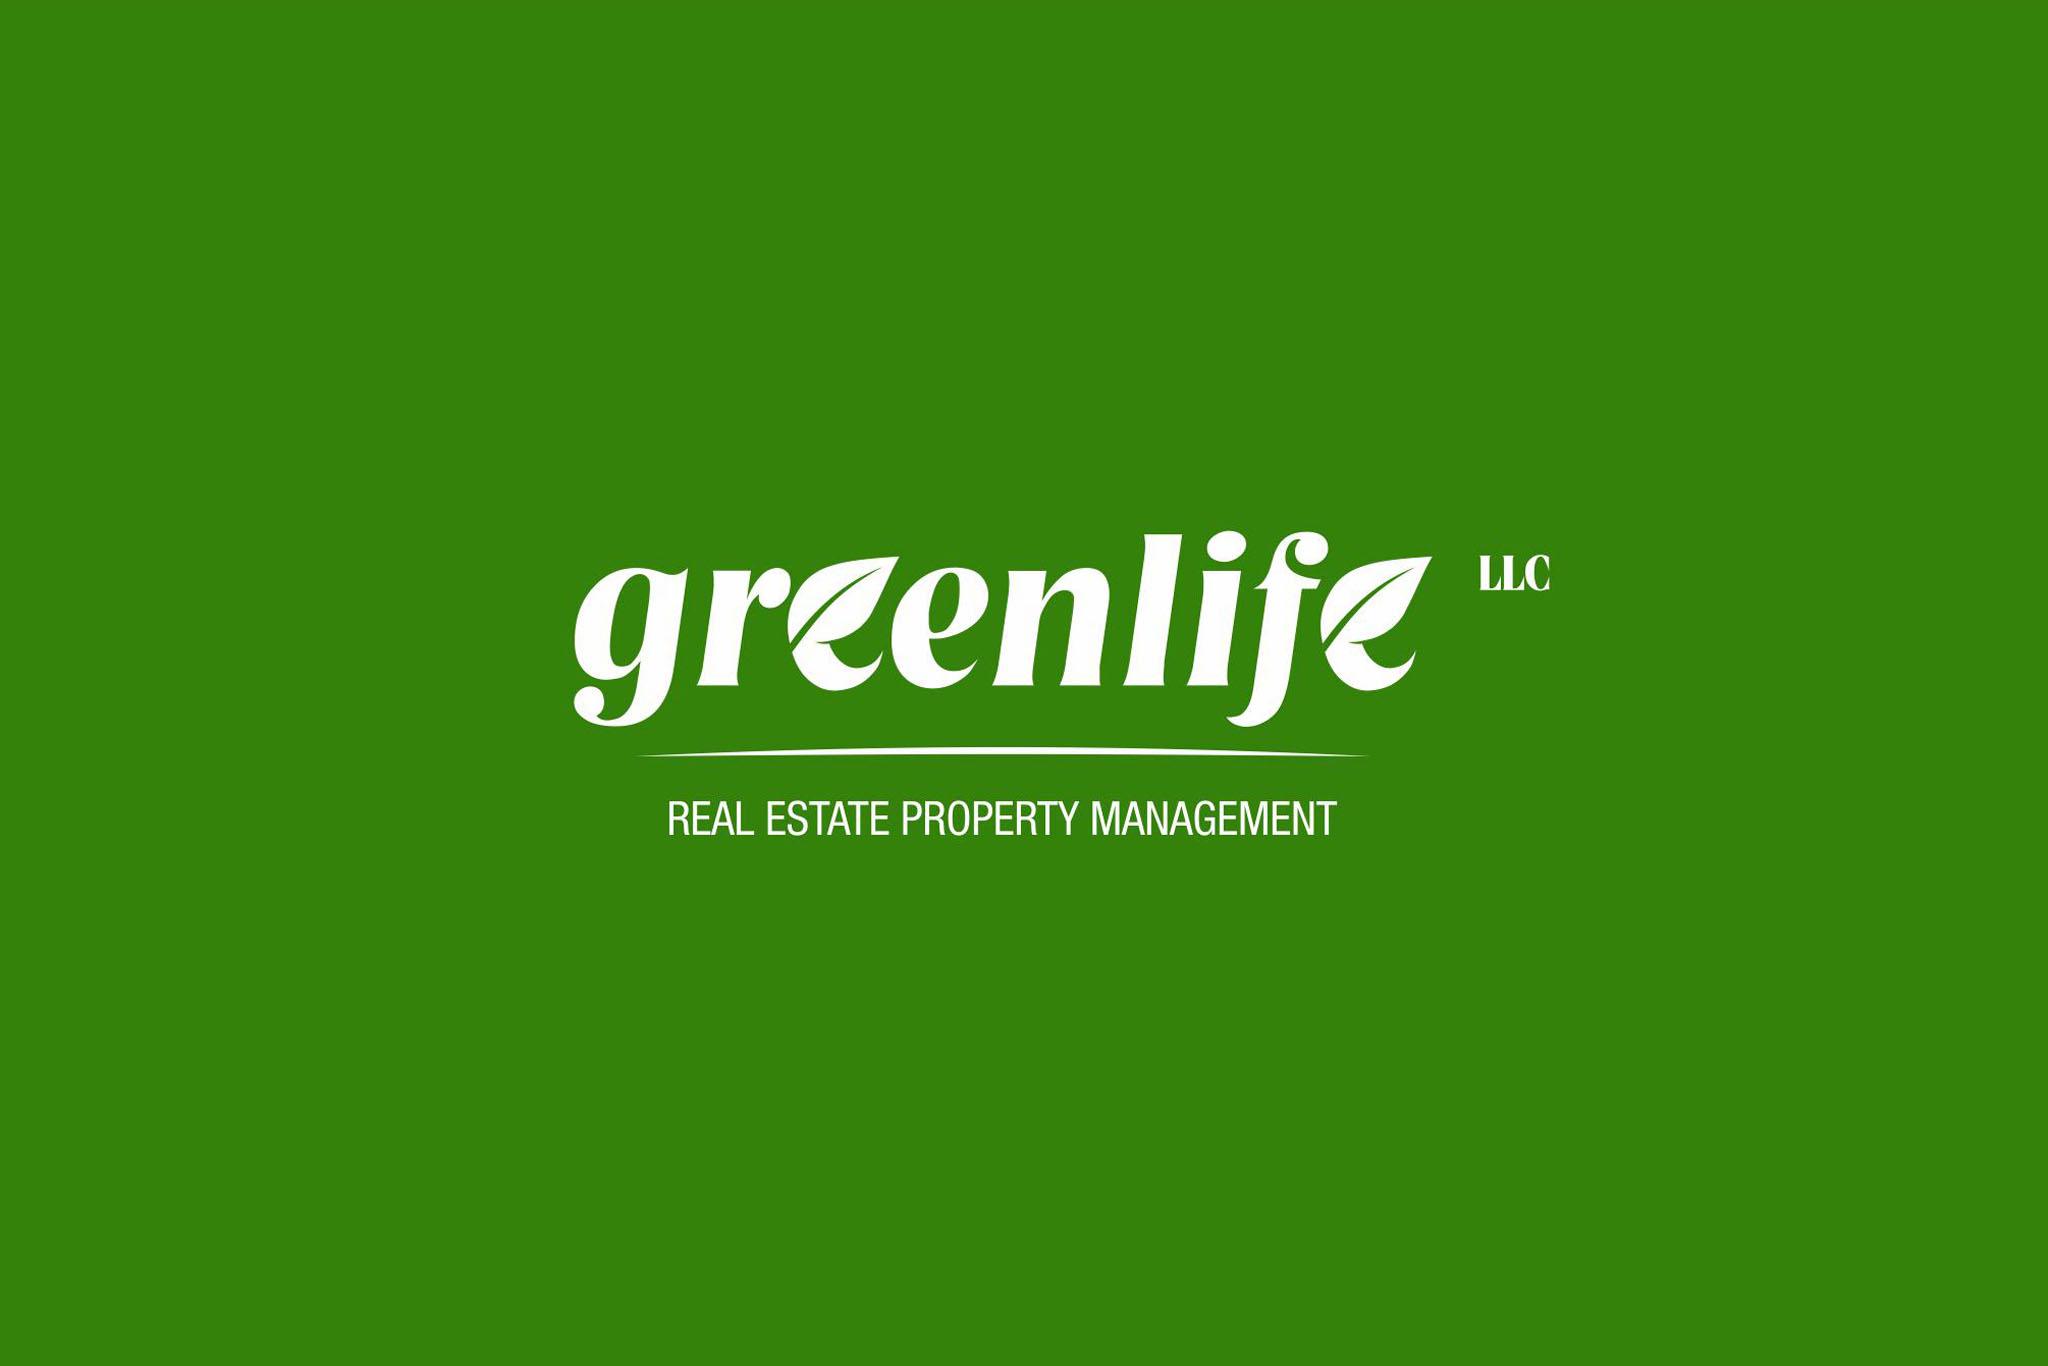 Greenlife Real Estate